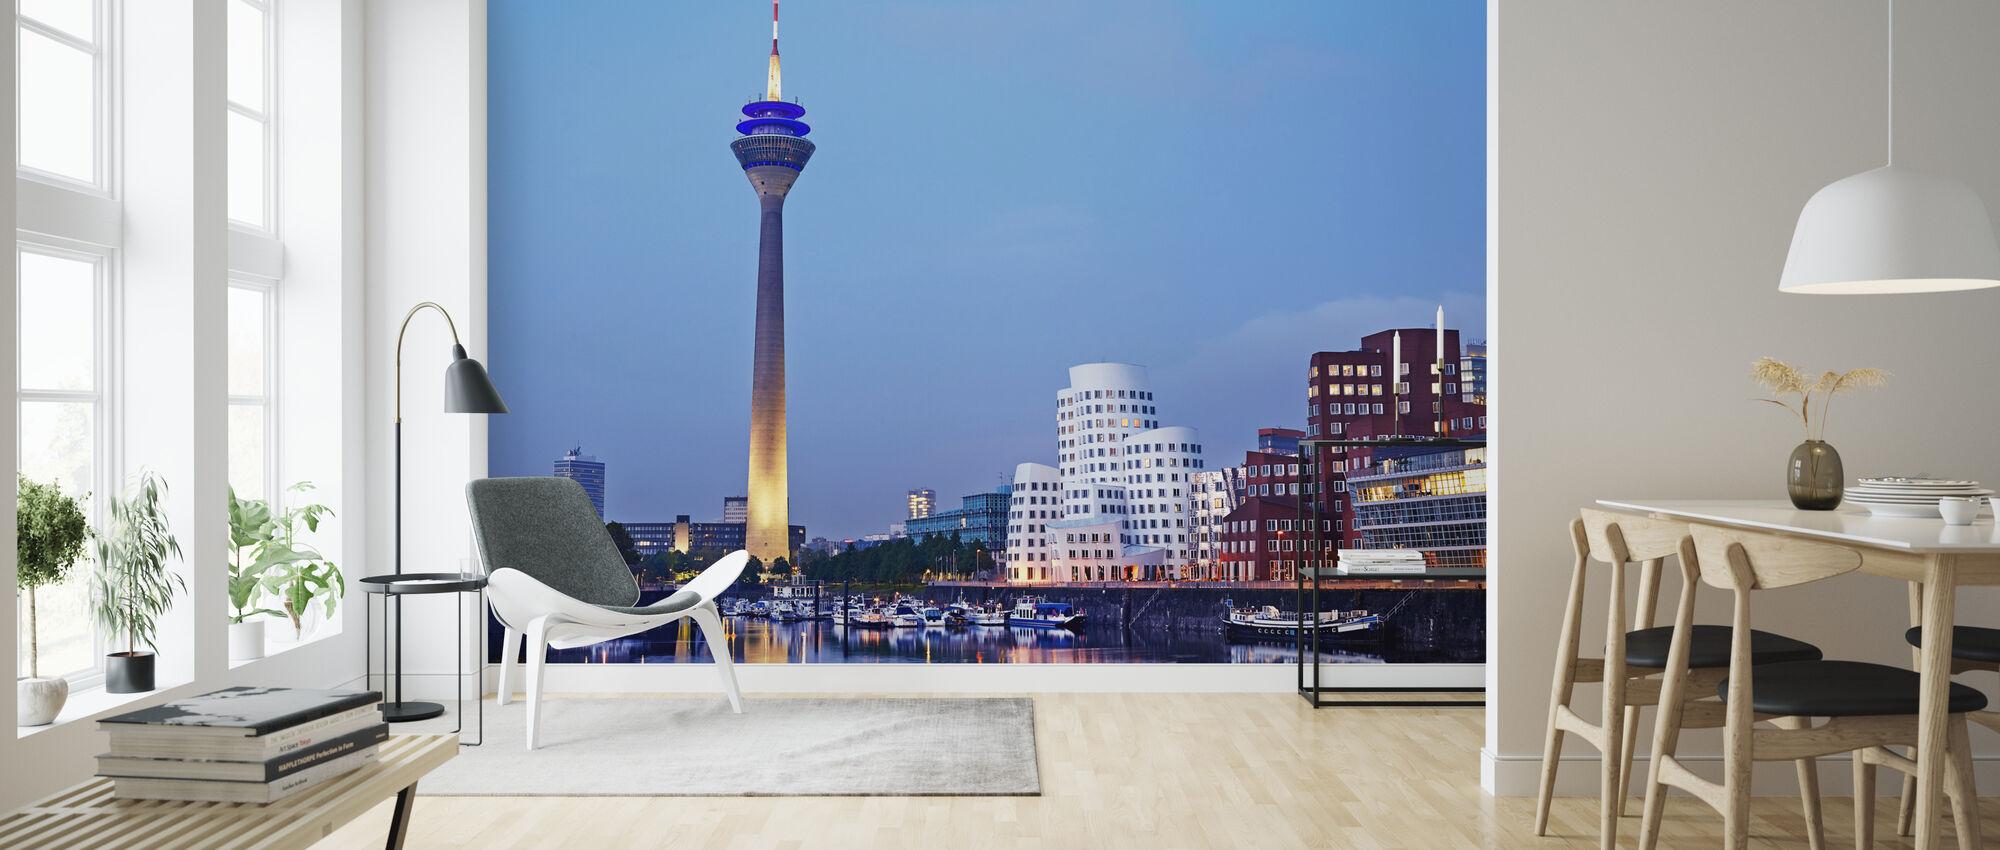 Düsseldorf's Rheinturm Tower at Dusk - Wallpaper - Living Room